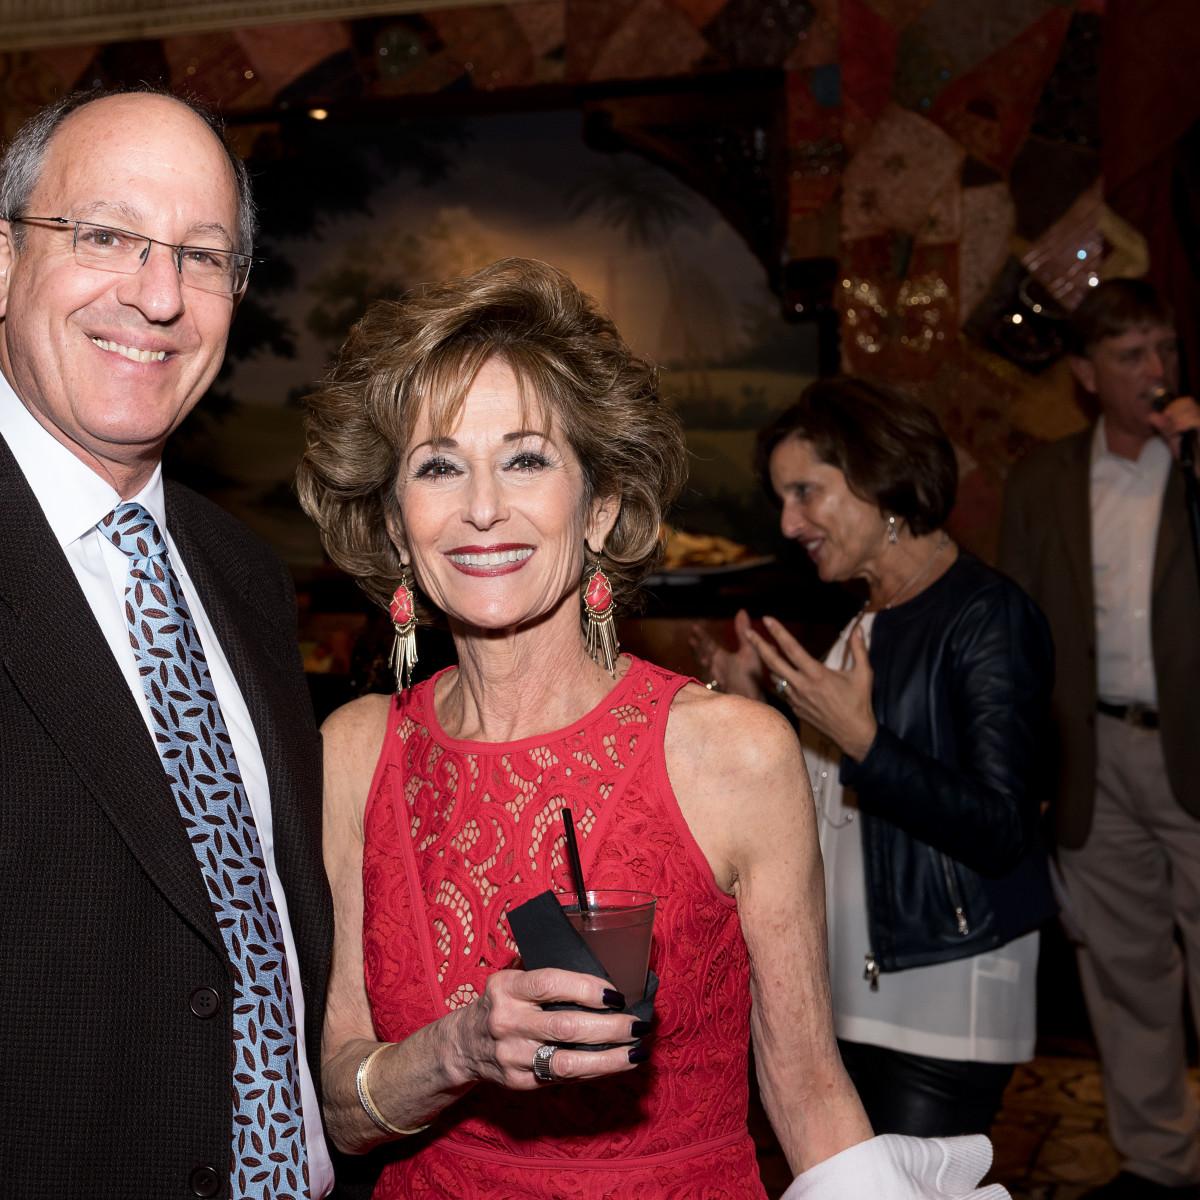 News, NCJW gala, Nov. 2015, Jay Steinfield, Karen Freedman